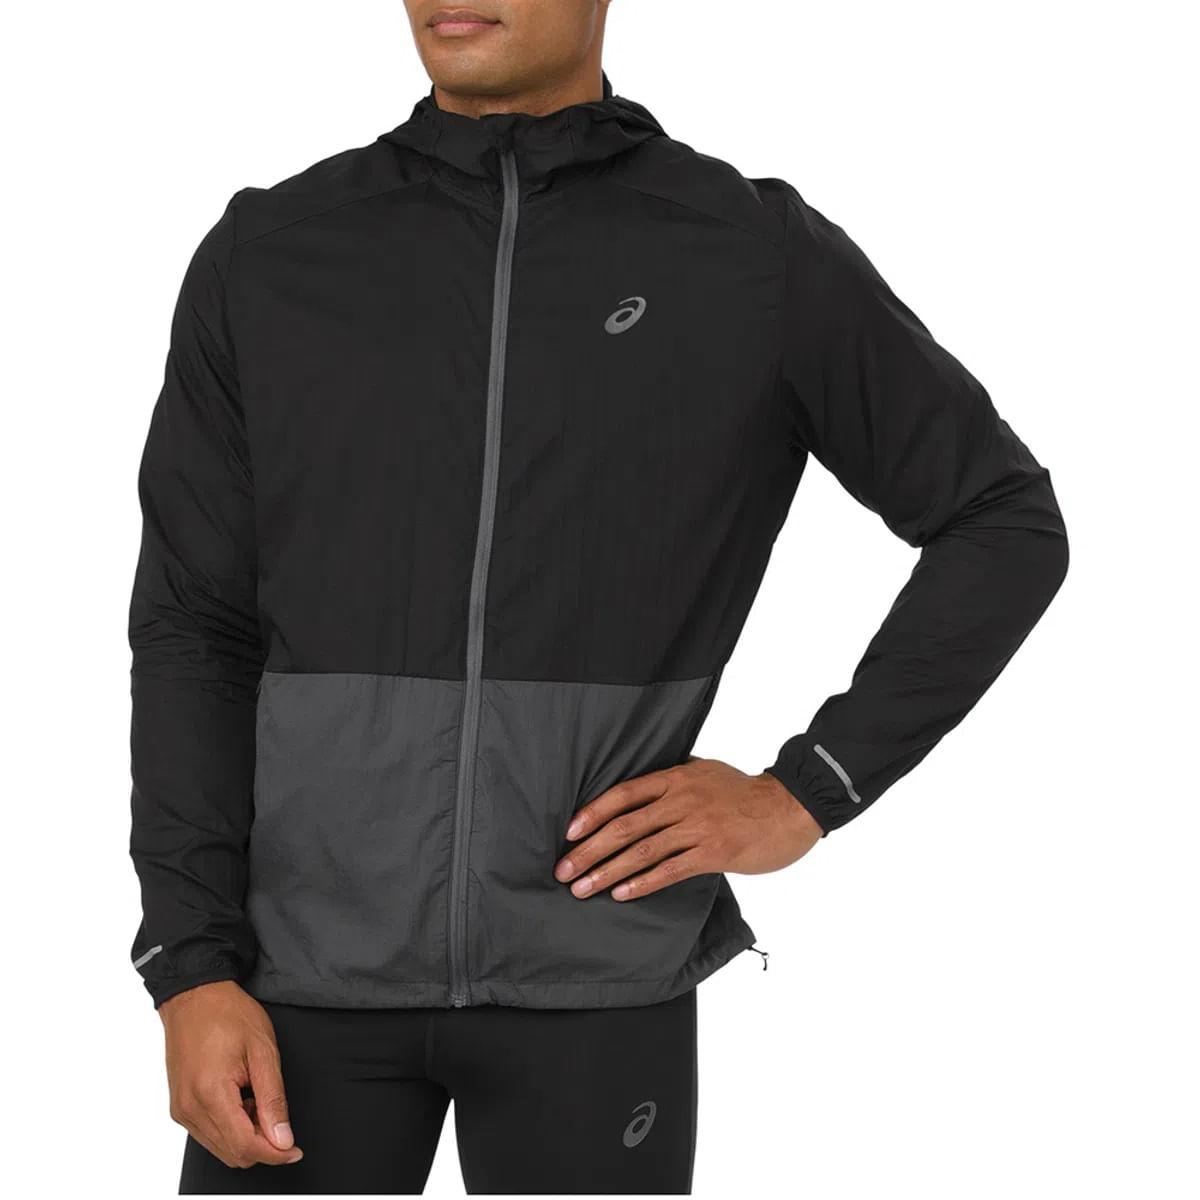 Jaqueta-Asics-Jacket---Masculino---Preto